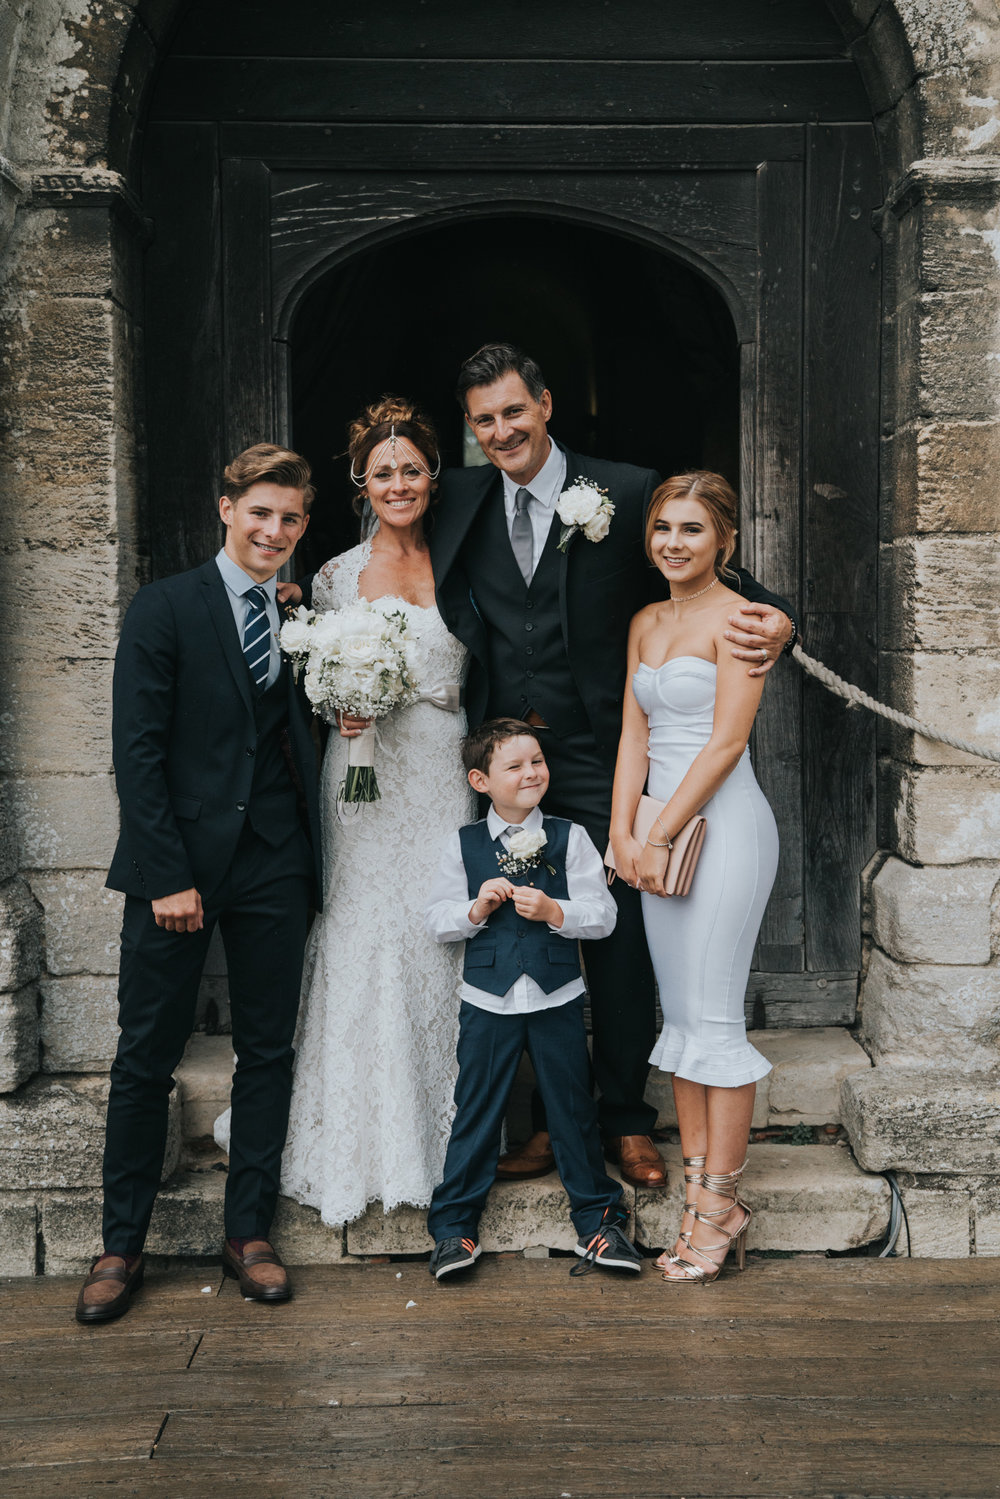 grace-elizabeth-boho-wedding-headingham-castle-essex-wedding-photographer-56.jpg